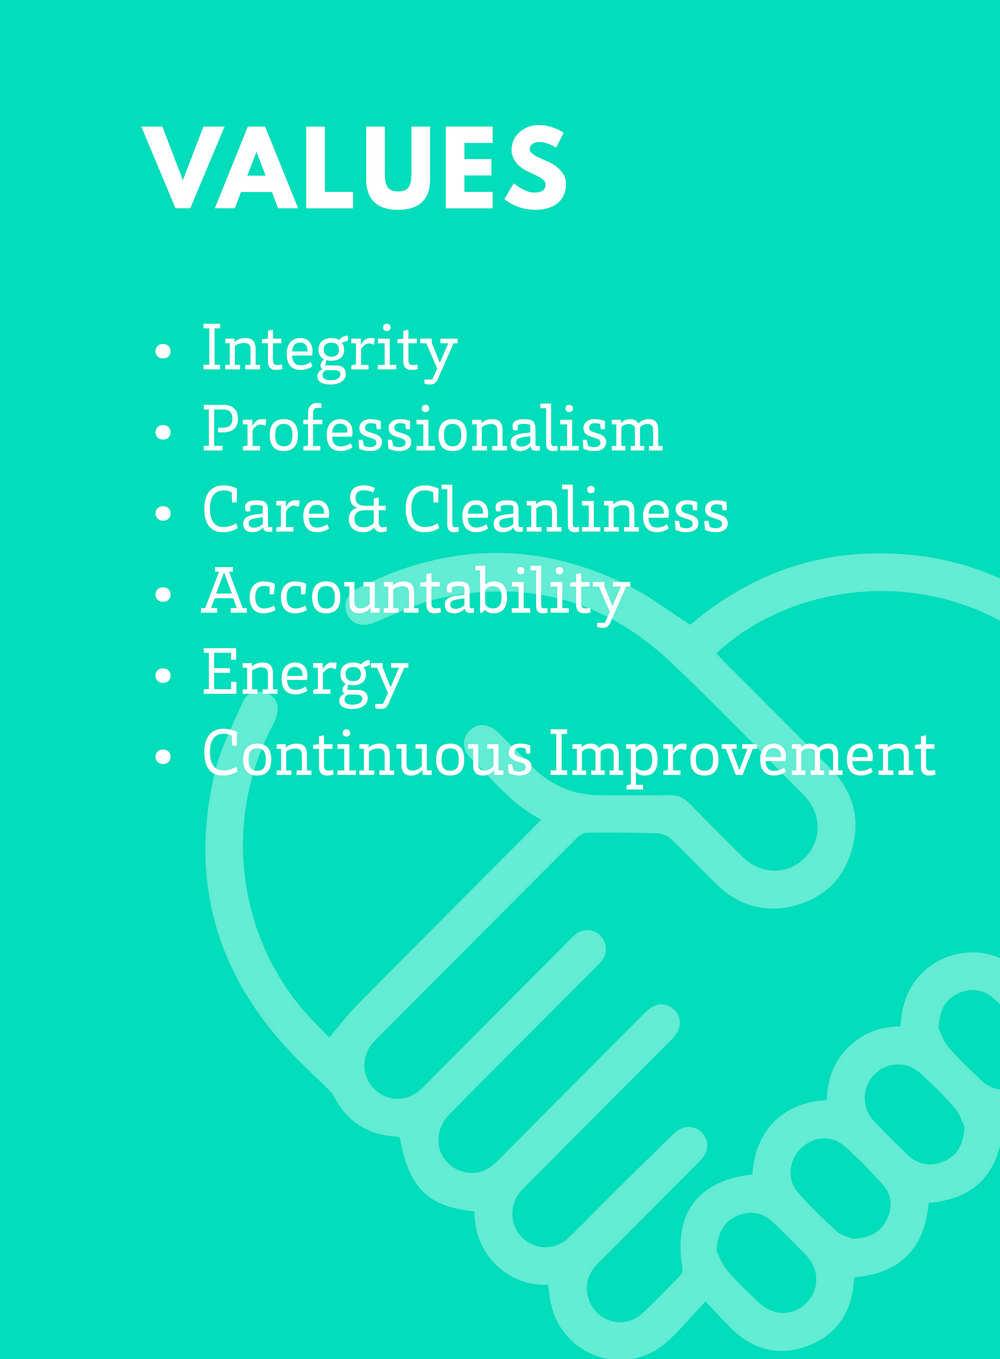 Vision, Mission, Values